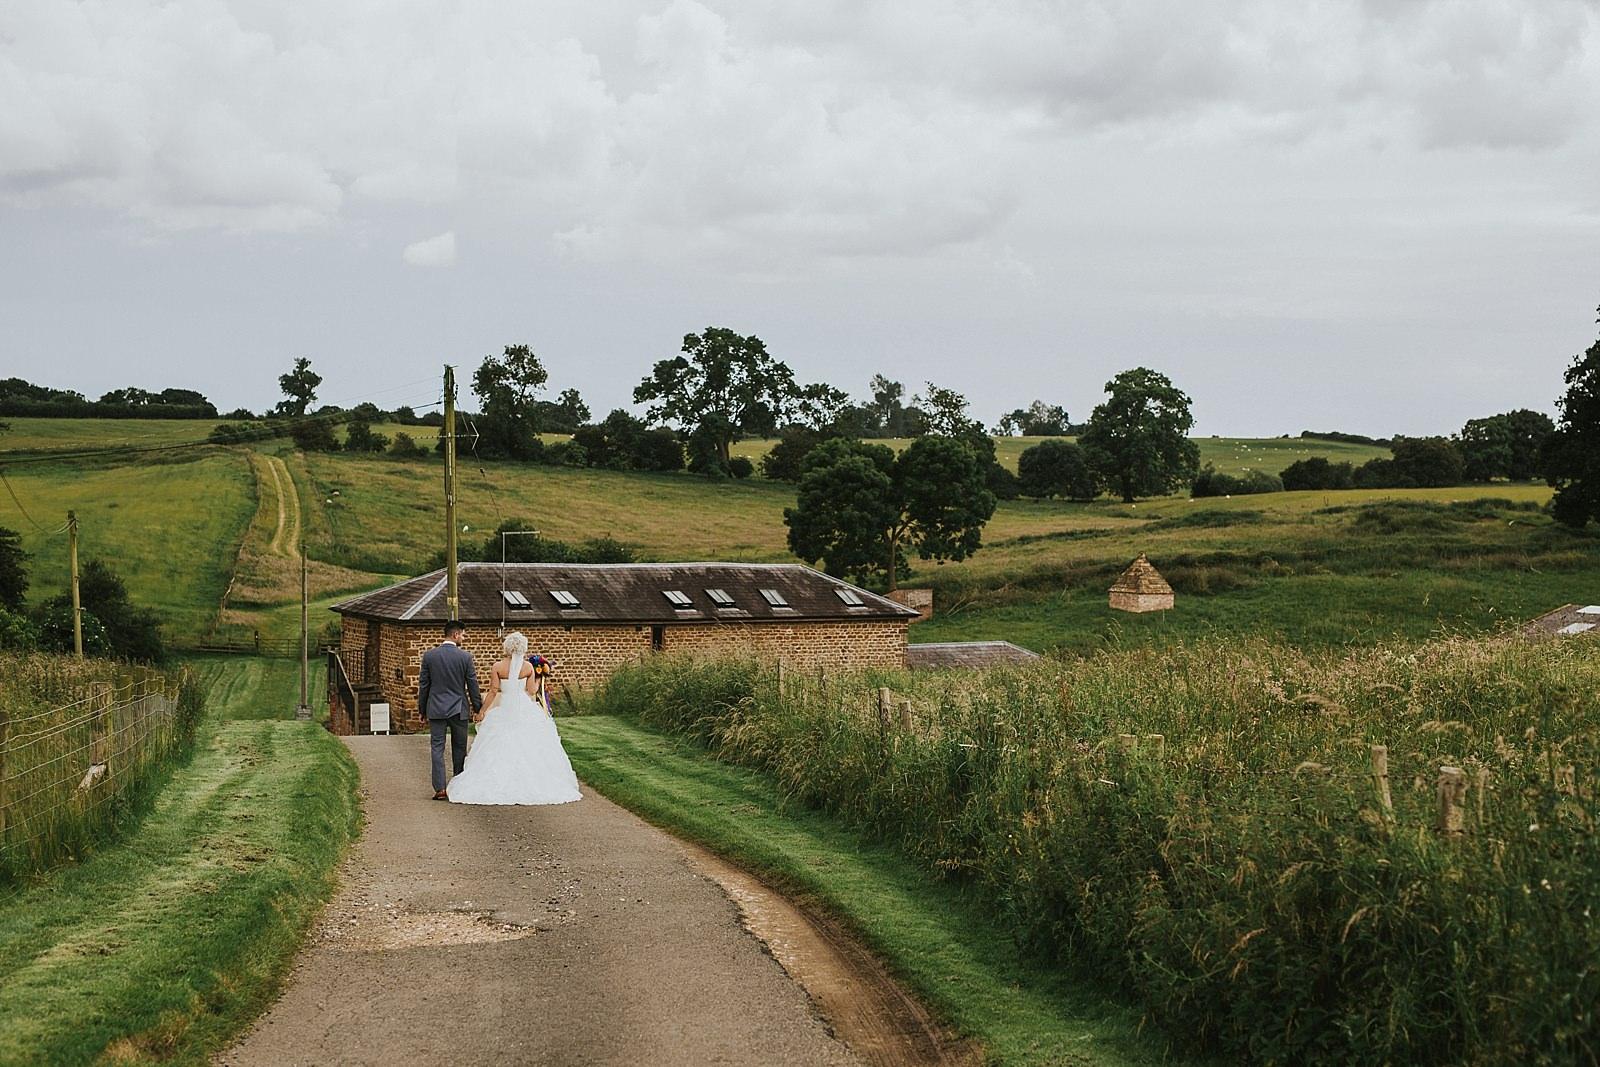 granary-at-fawsly-wedding-paula-stephen-417